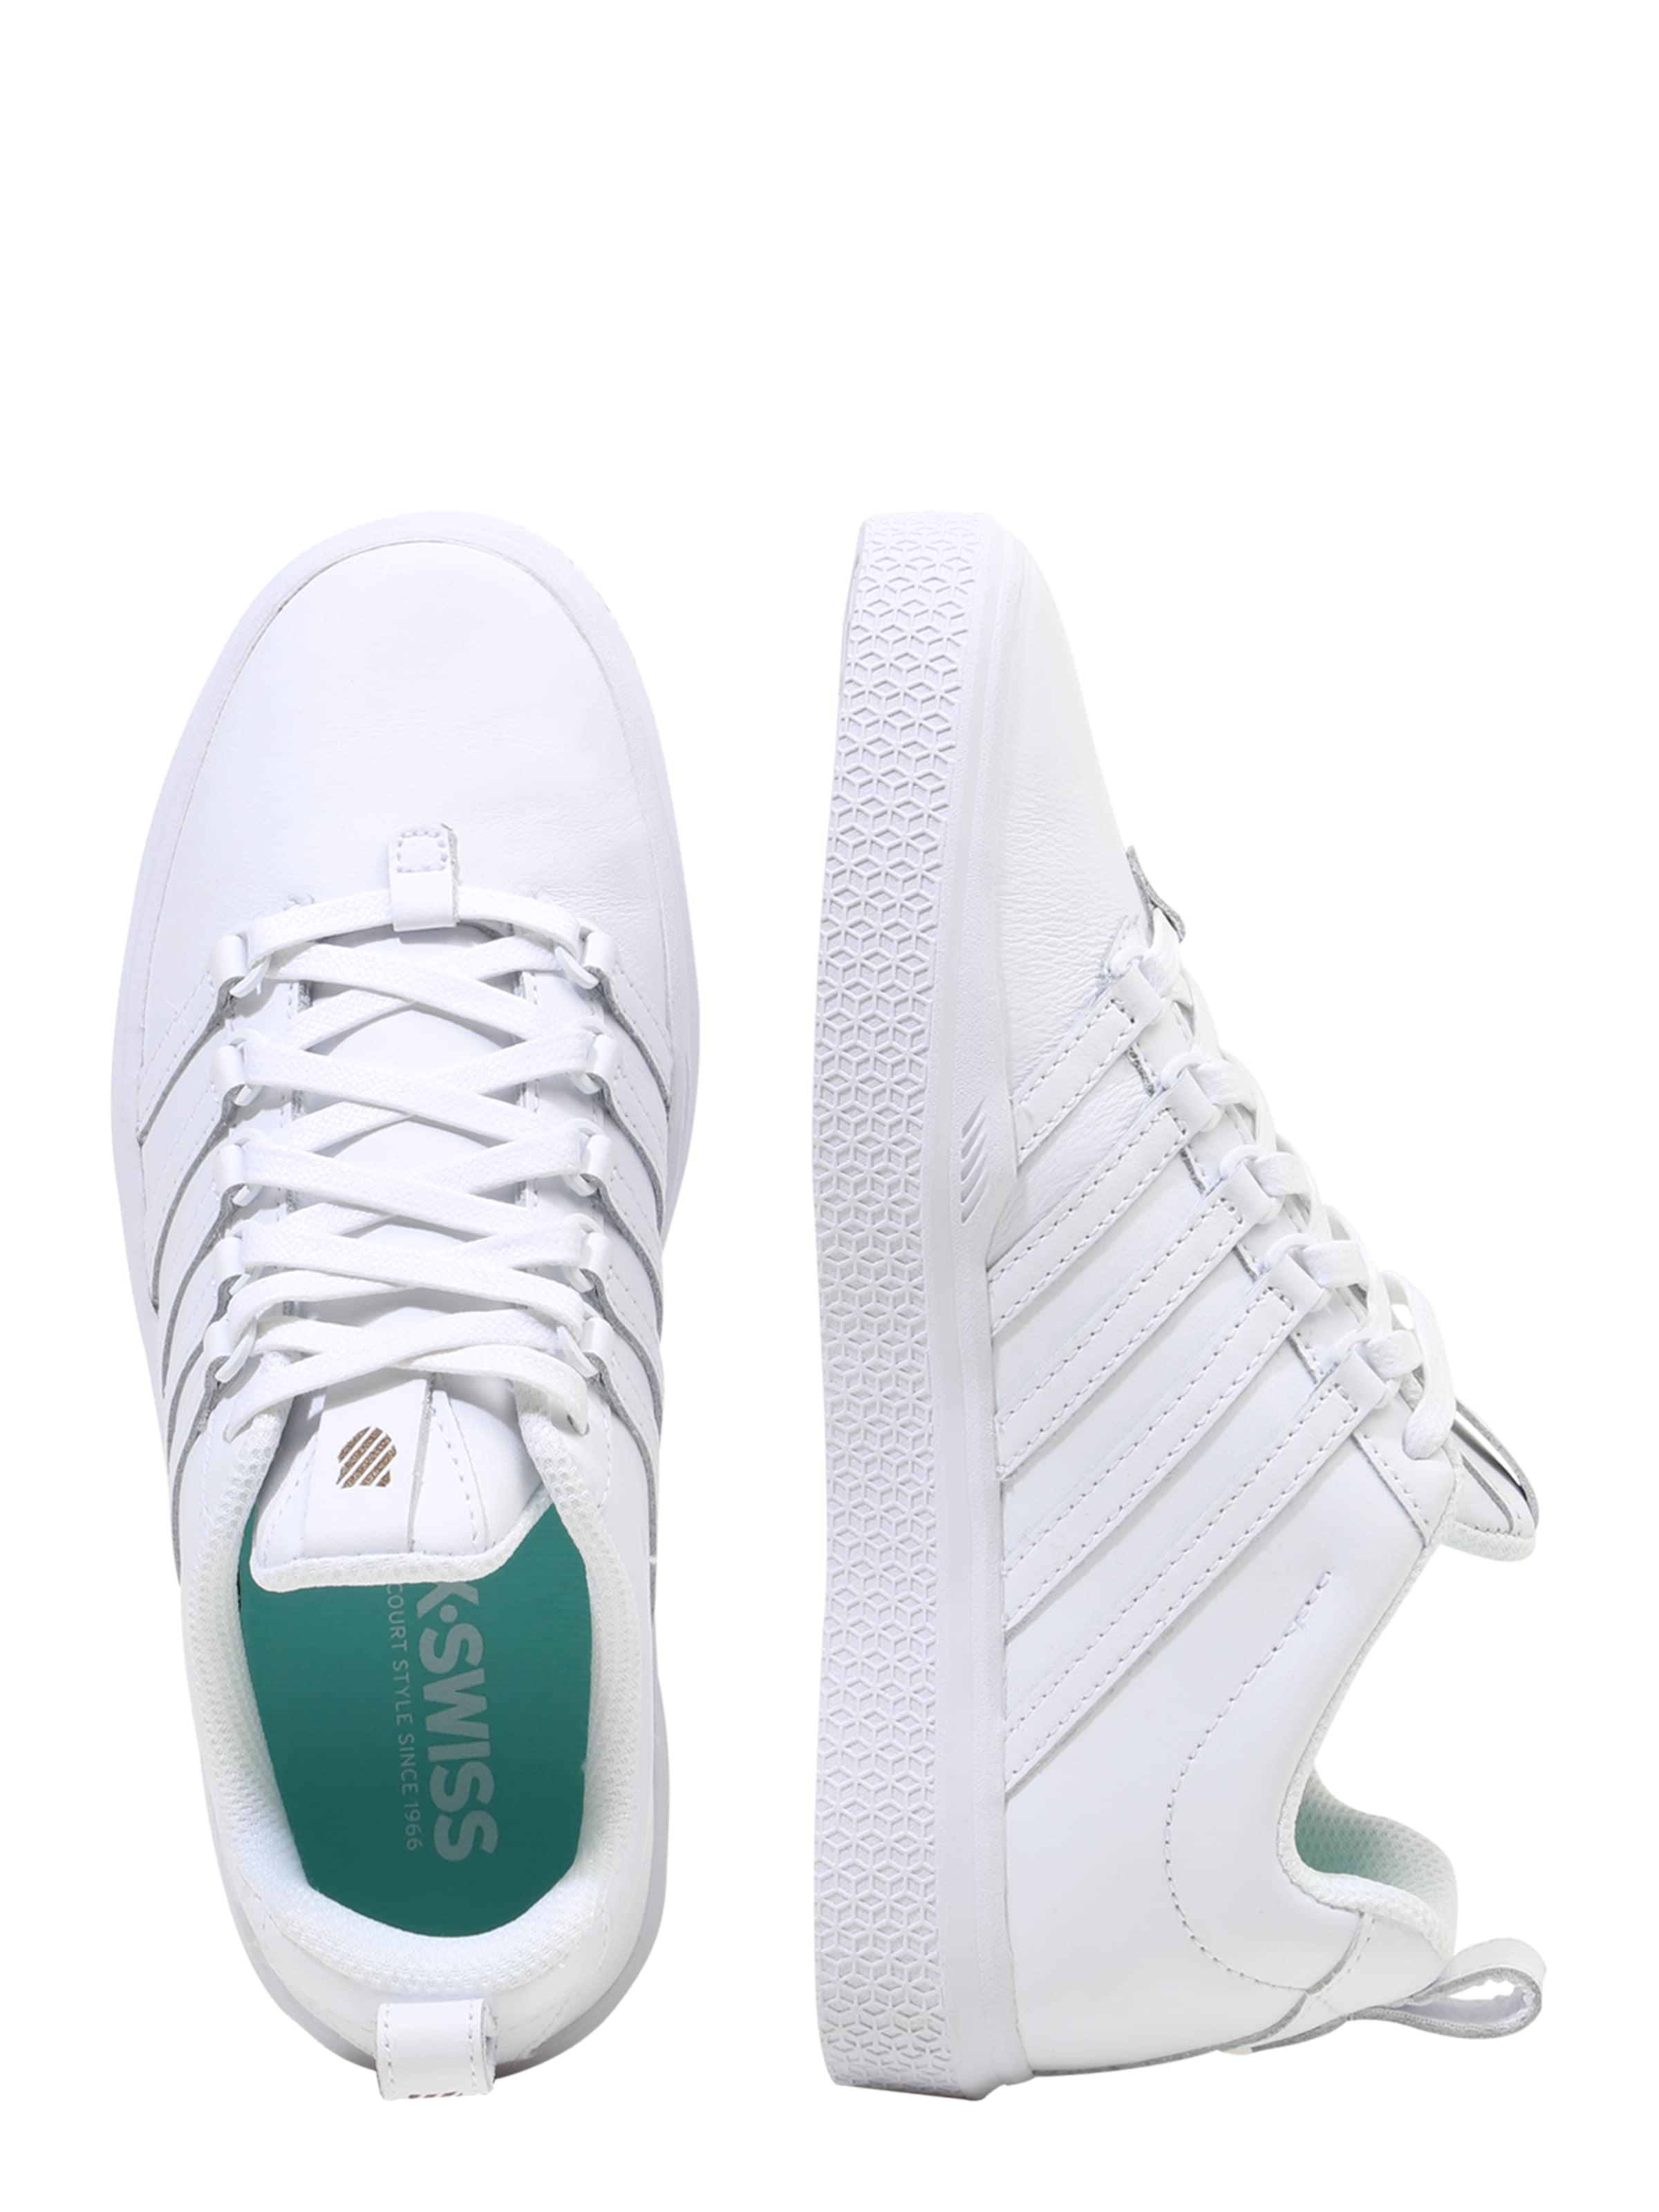 K In Weiß swiss 'donovan' Sneaker OZkiwXTPu